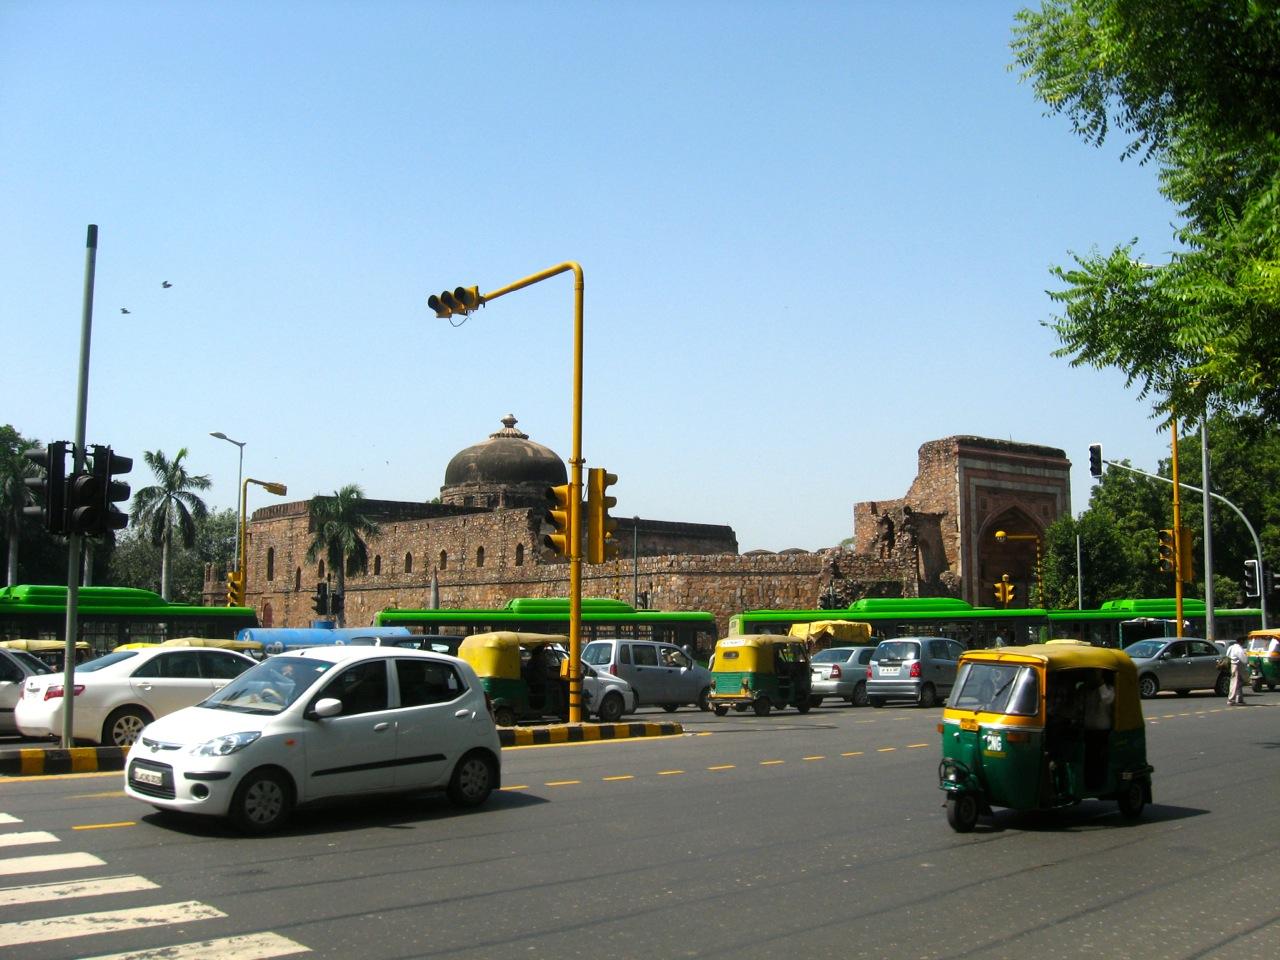 Delhi 7-11